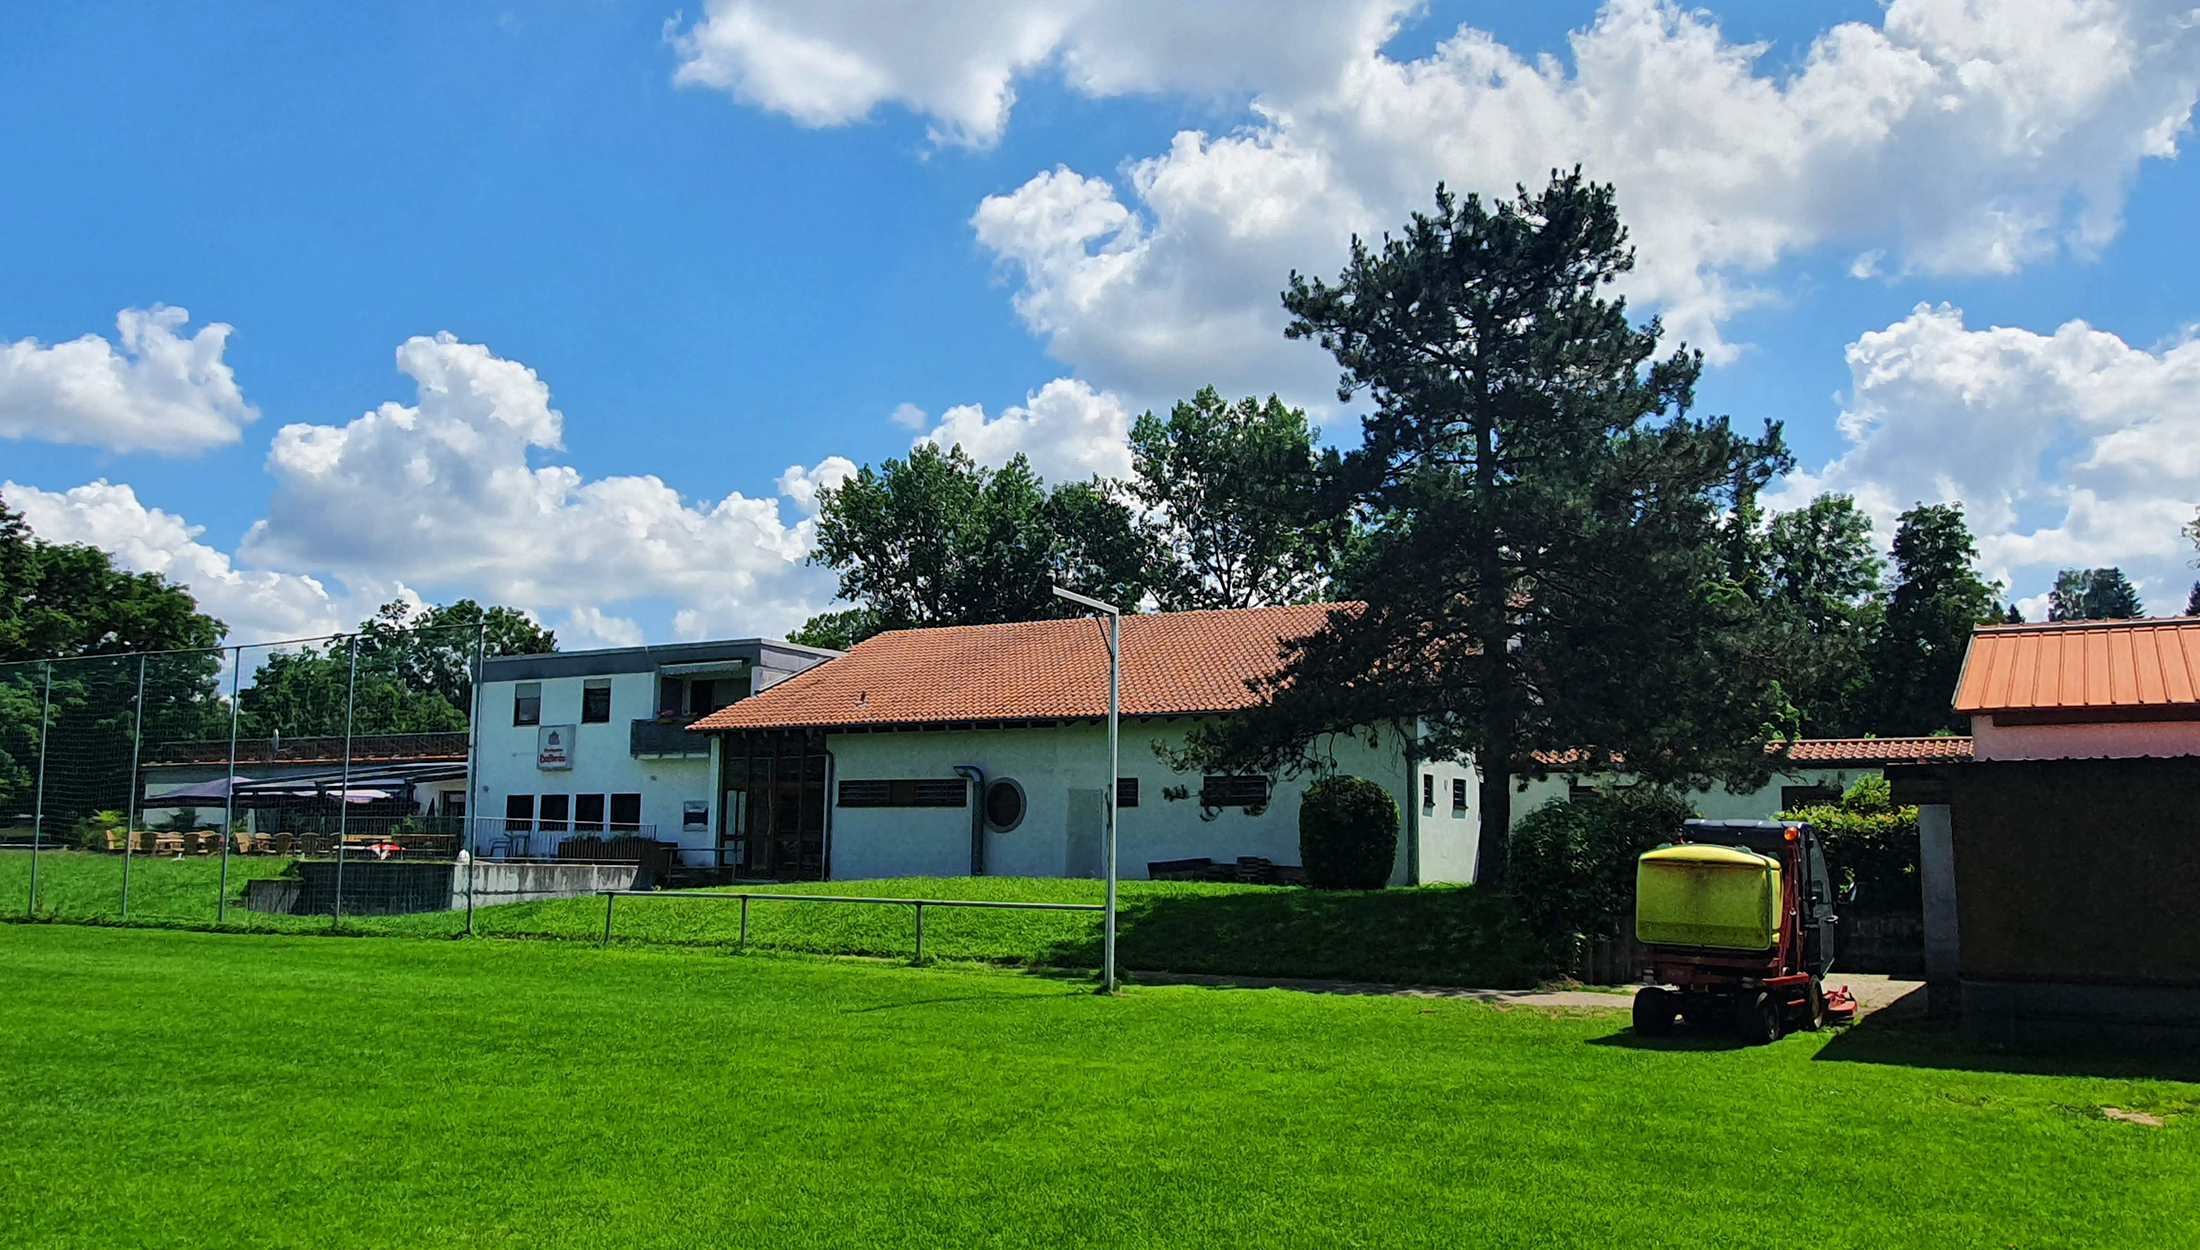 2021, Bestandtsanalyse Sportpark, Wernau